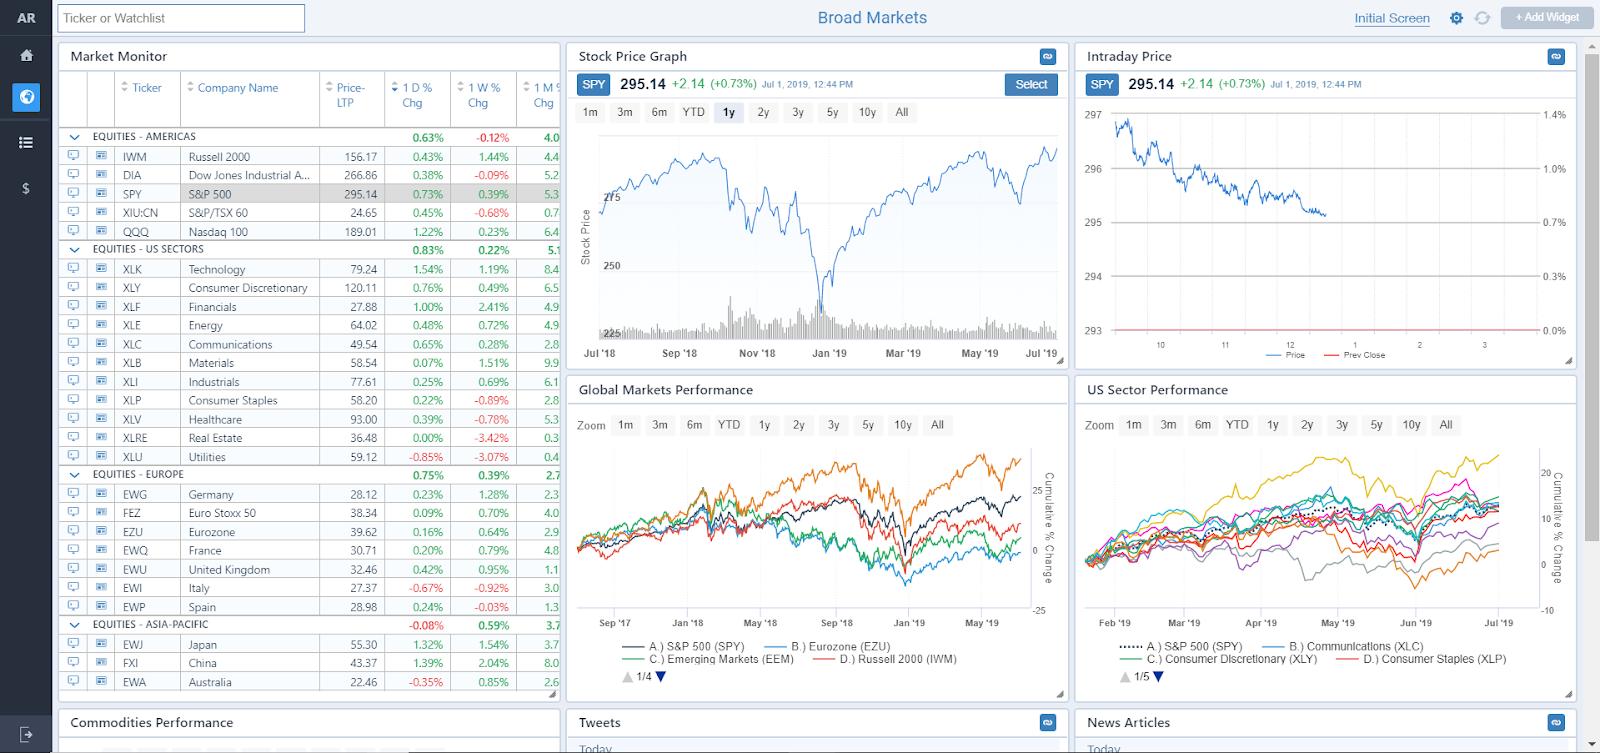 broad markets